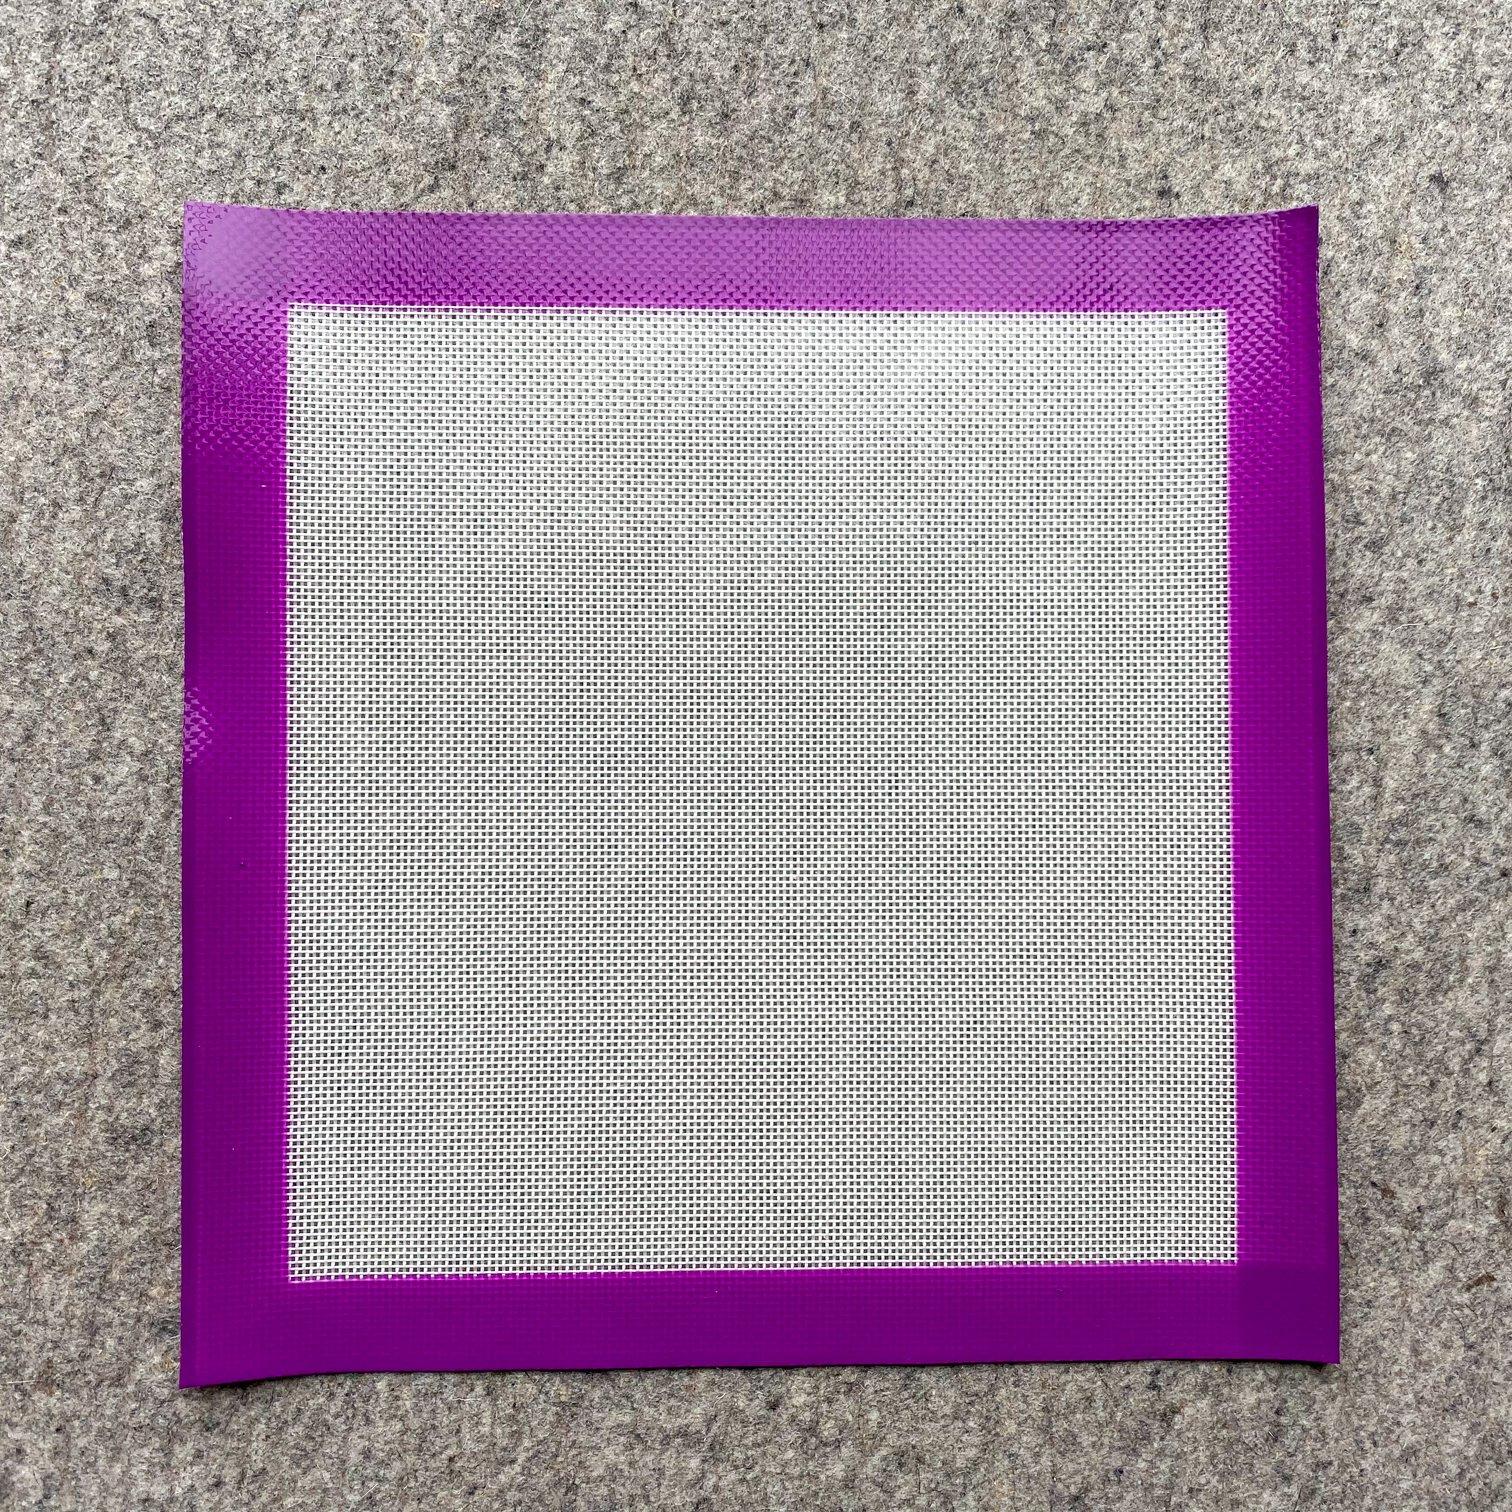 Silicone Applique Mat : 12x12